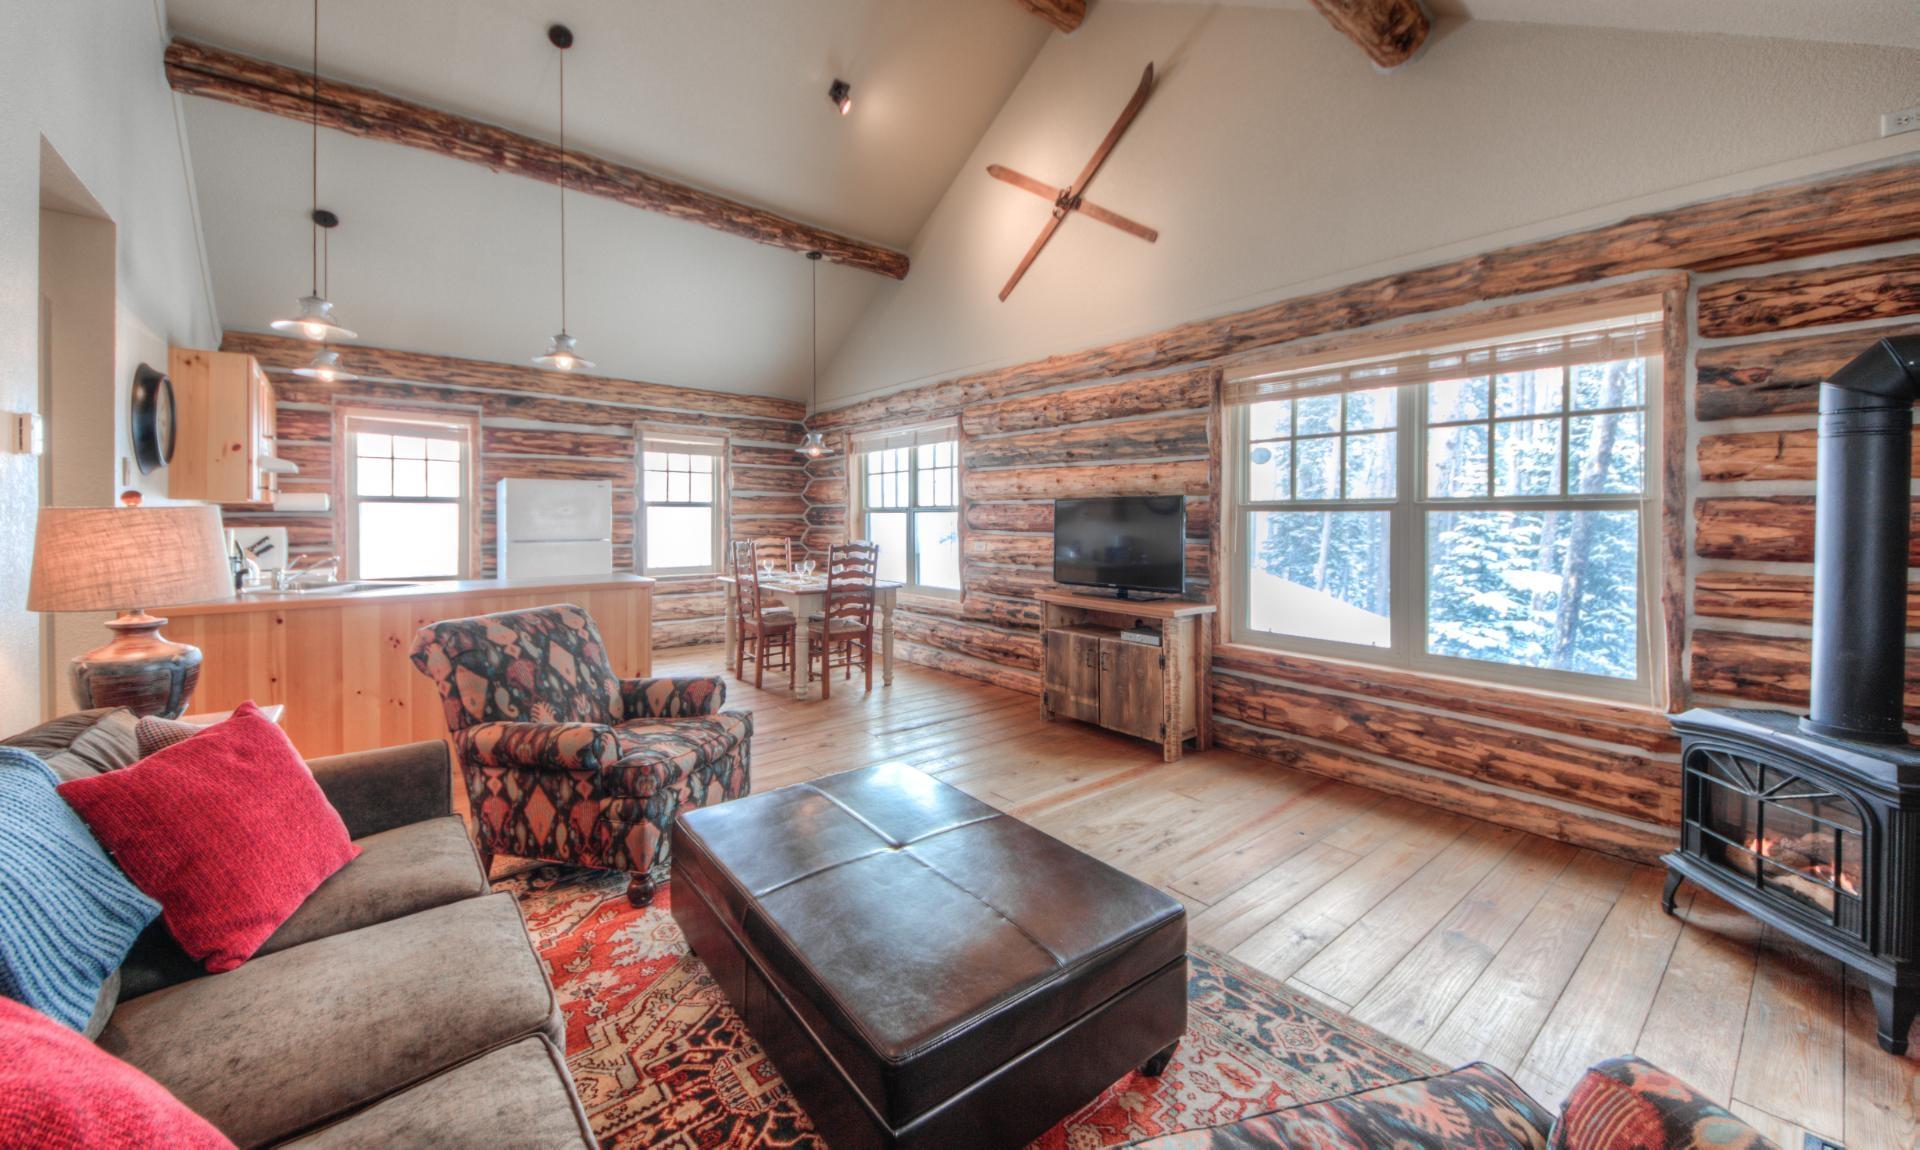 Luxury vacation rentals usa - Montana - Big sky moonlight basin - No location 4 - Cowboy Heaven Cabins | 3 Rustic Ridge - Image 1/36